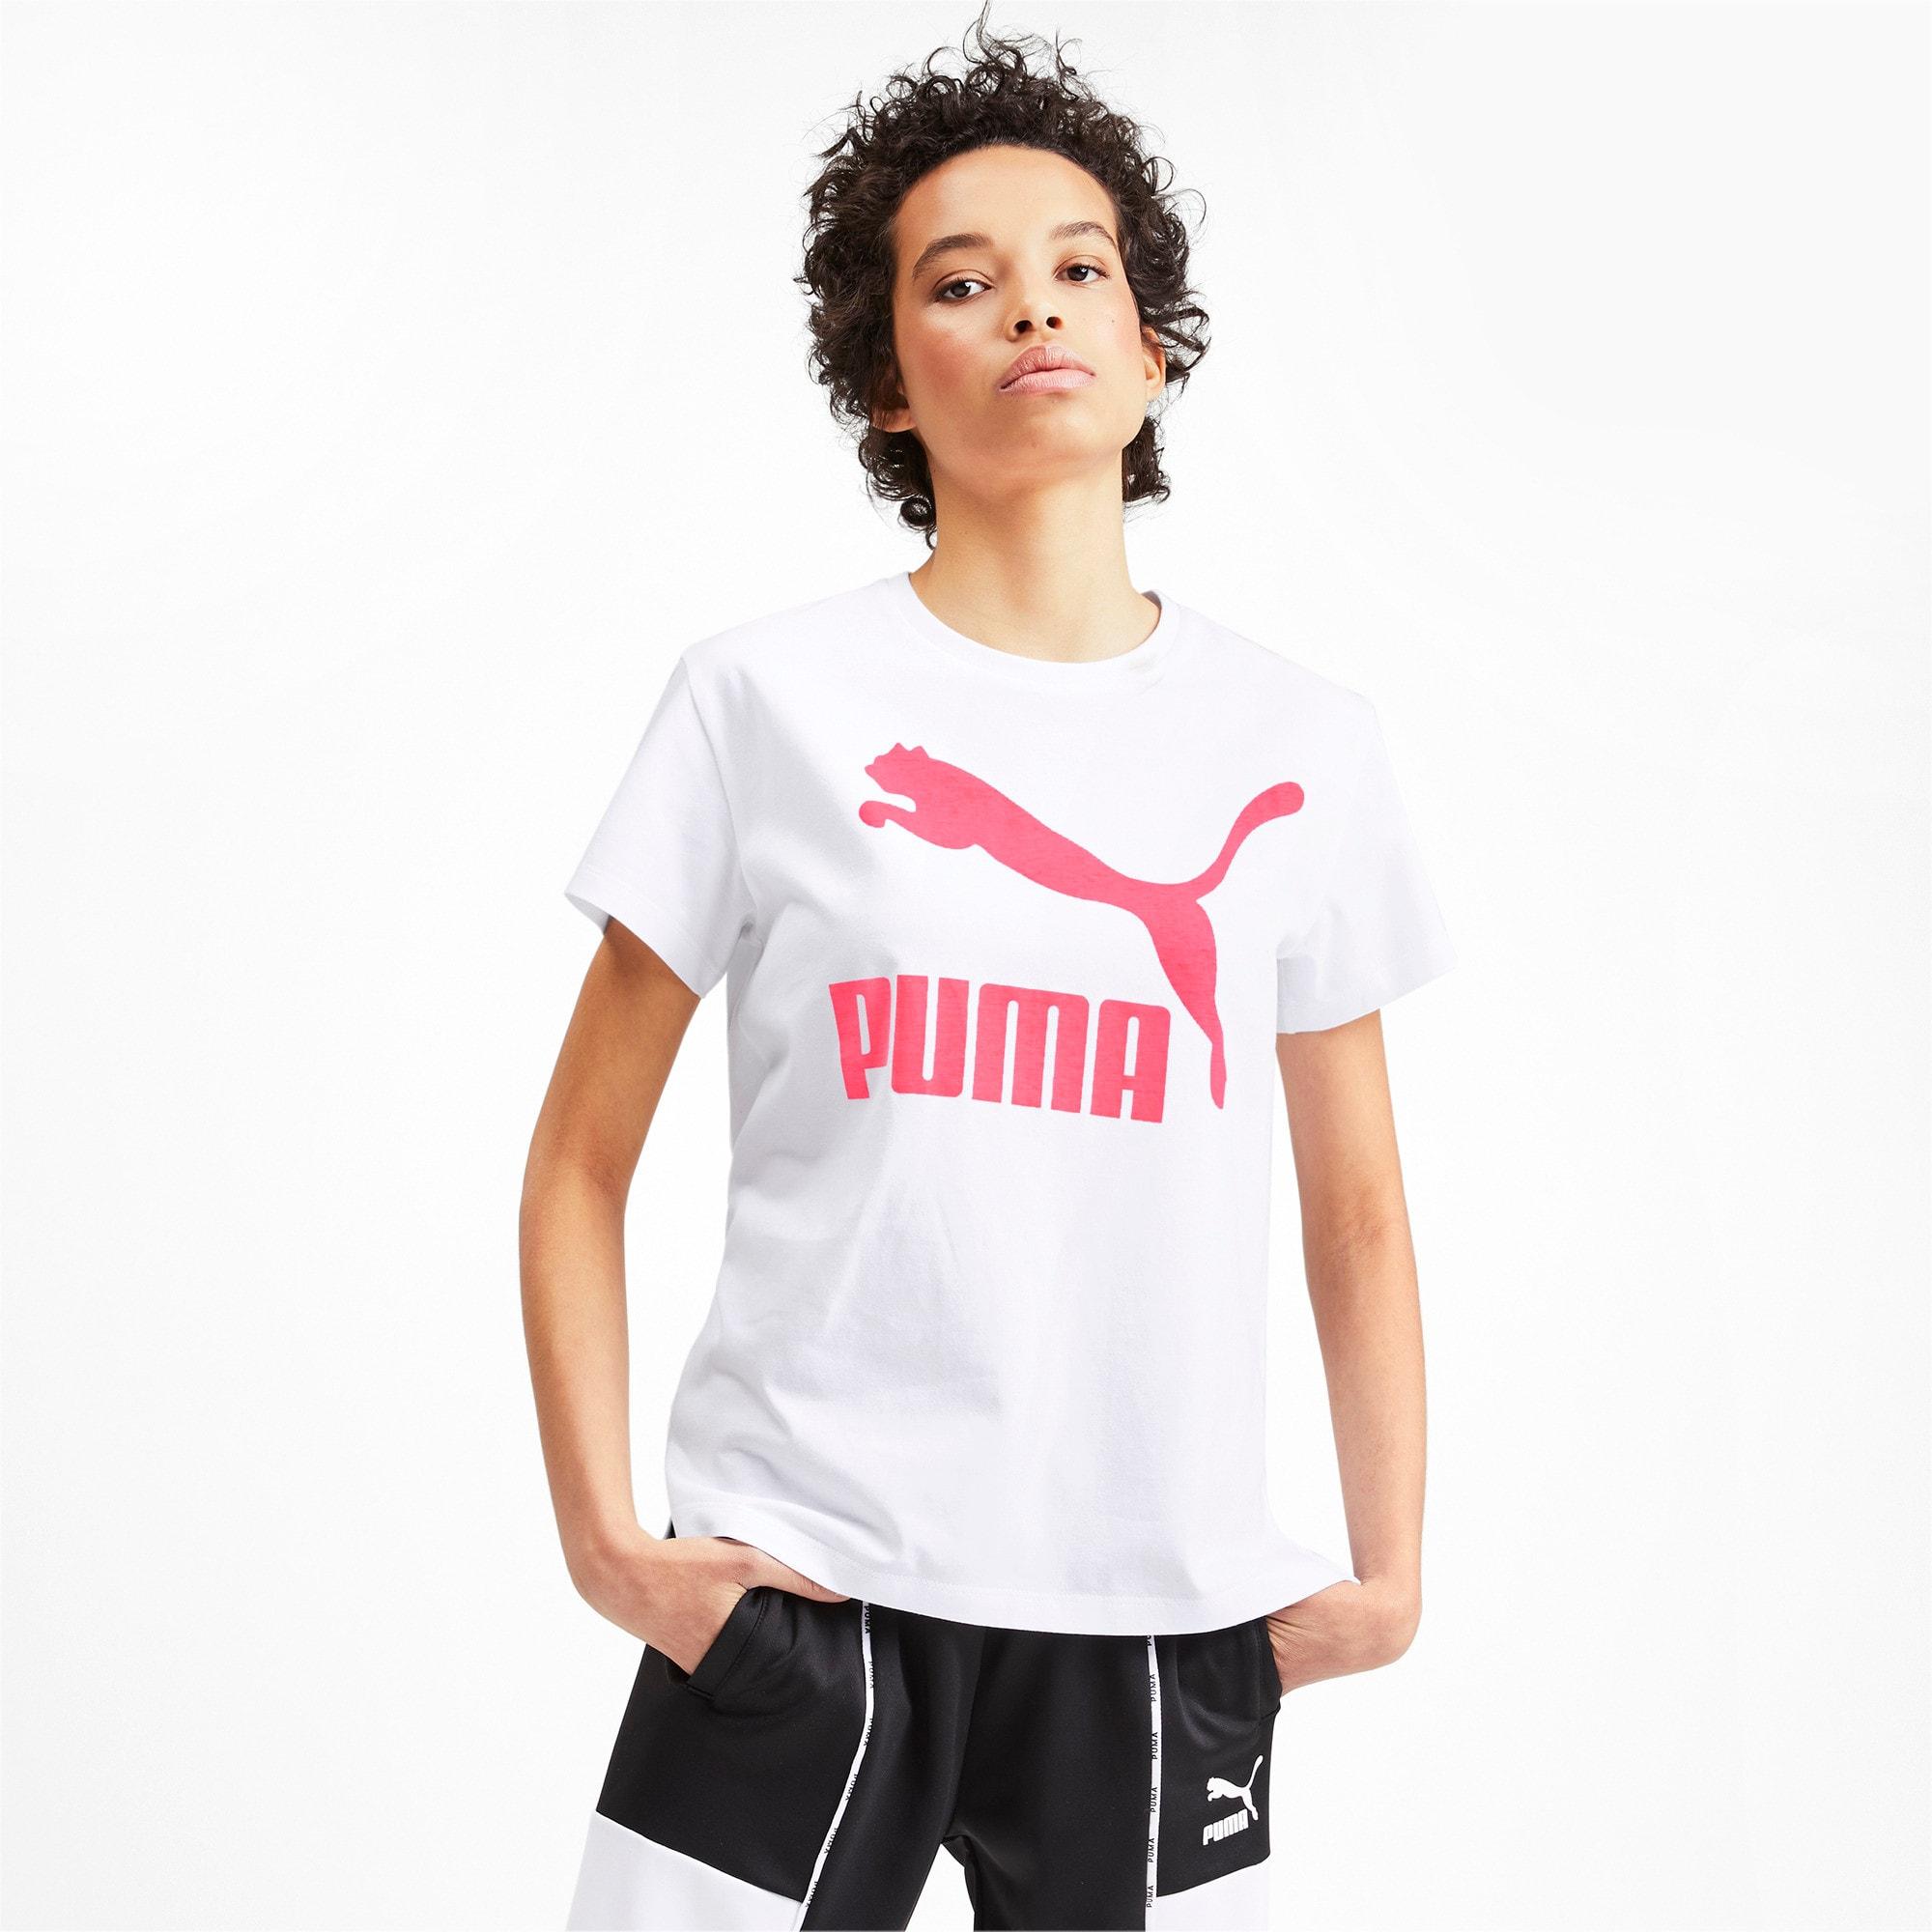 Thumbnail 2 of CLASSICS ロゴ ウィメンズ SS Tシャツ, Puma White, medium-JPN